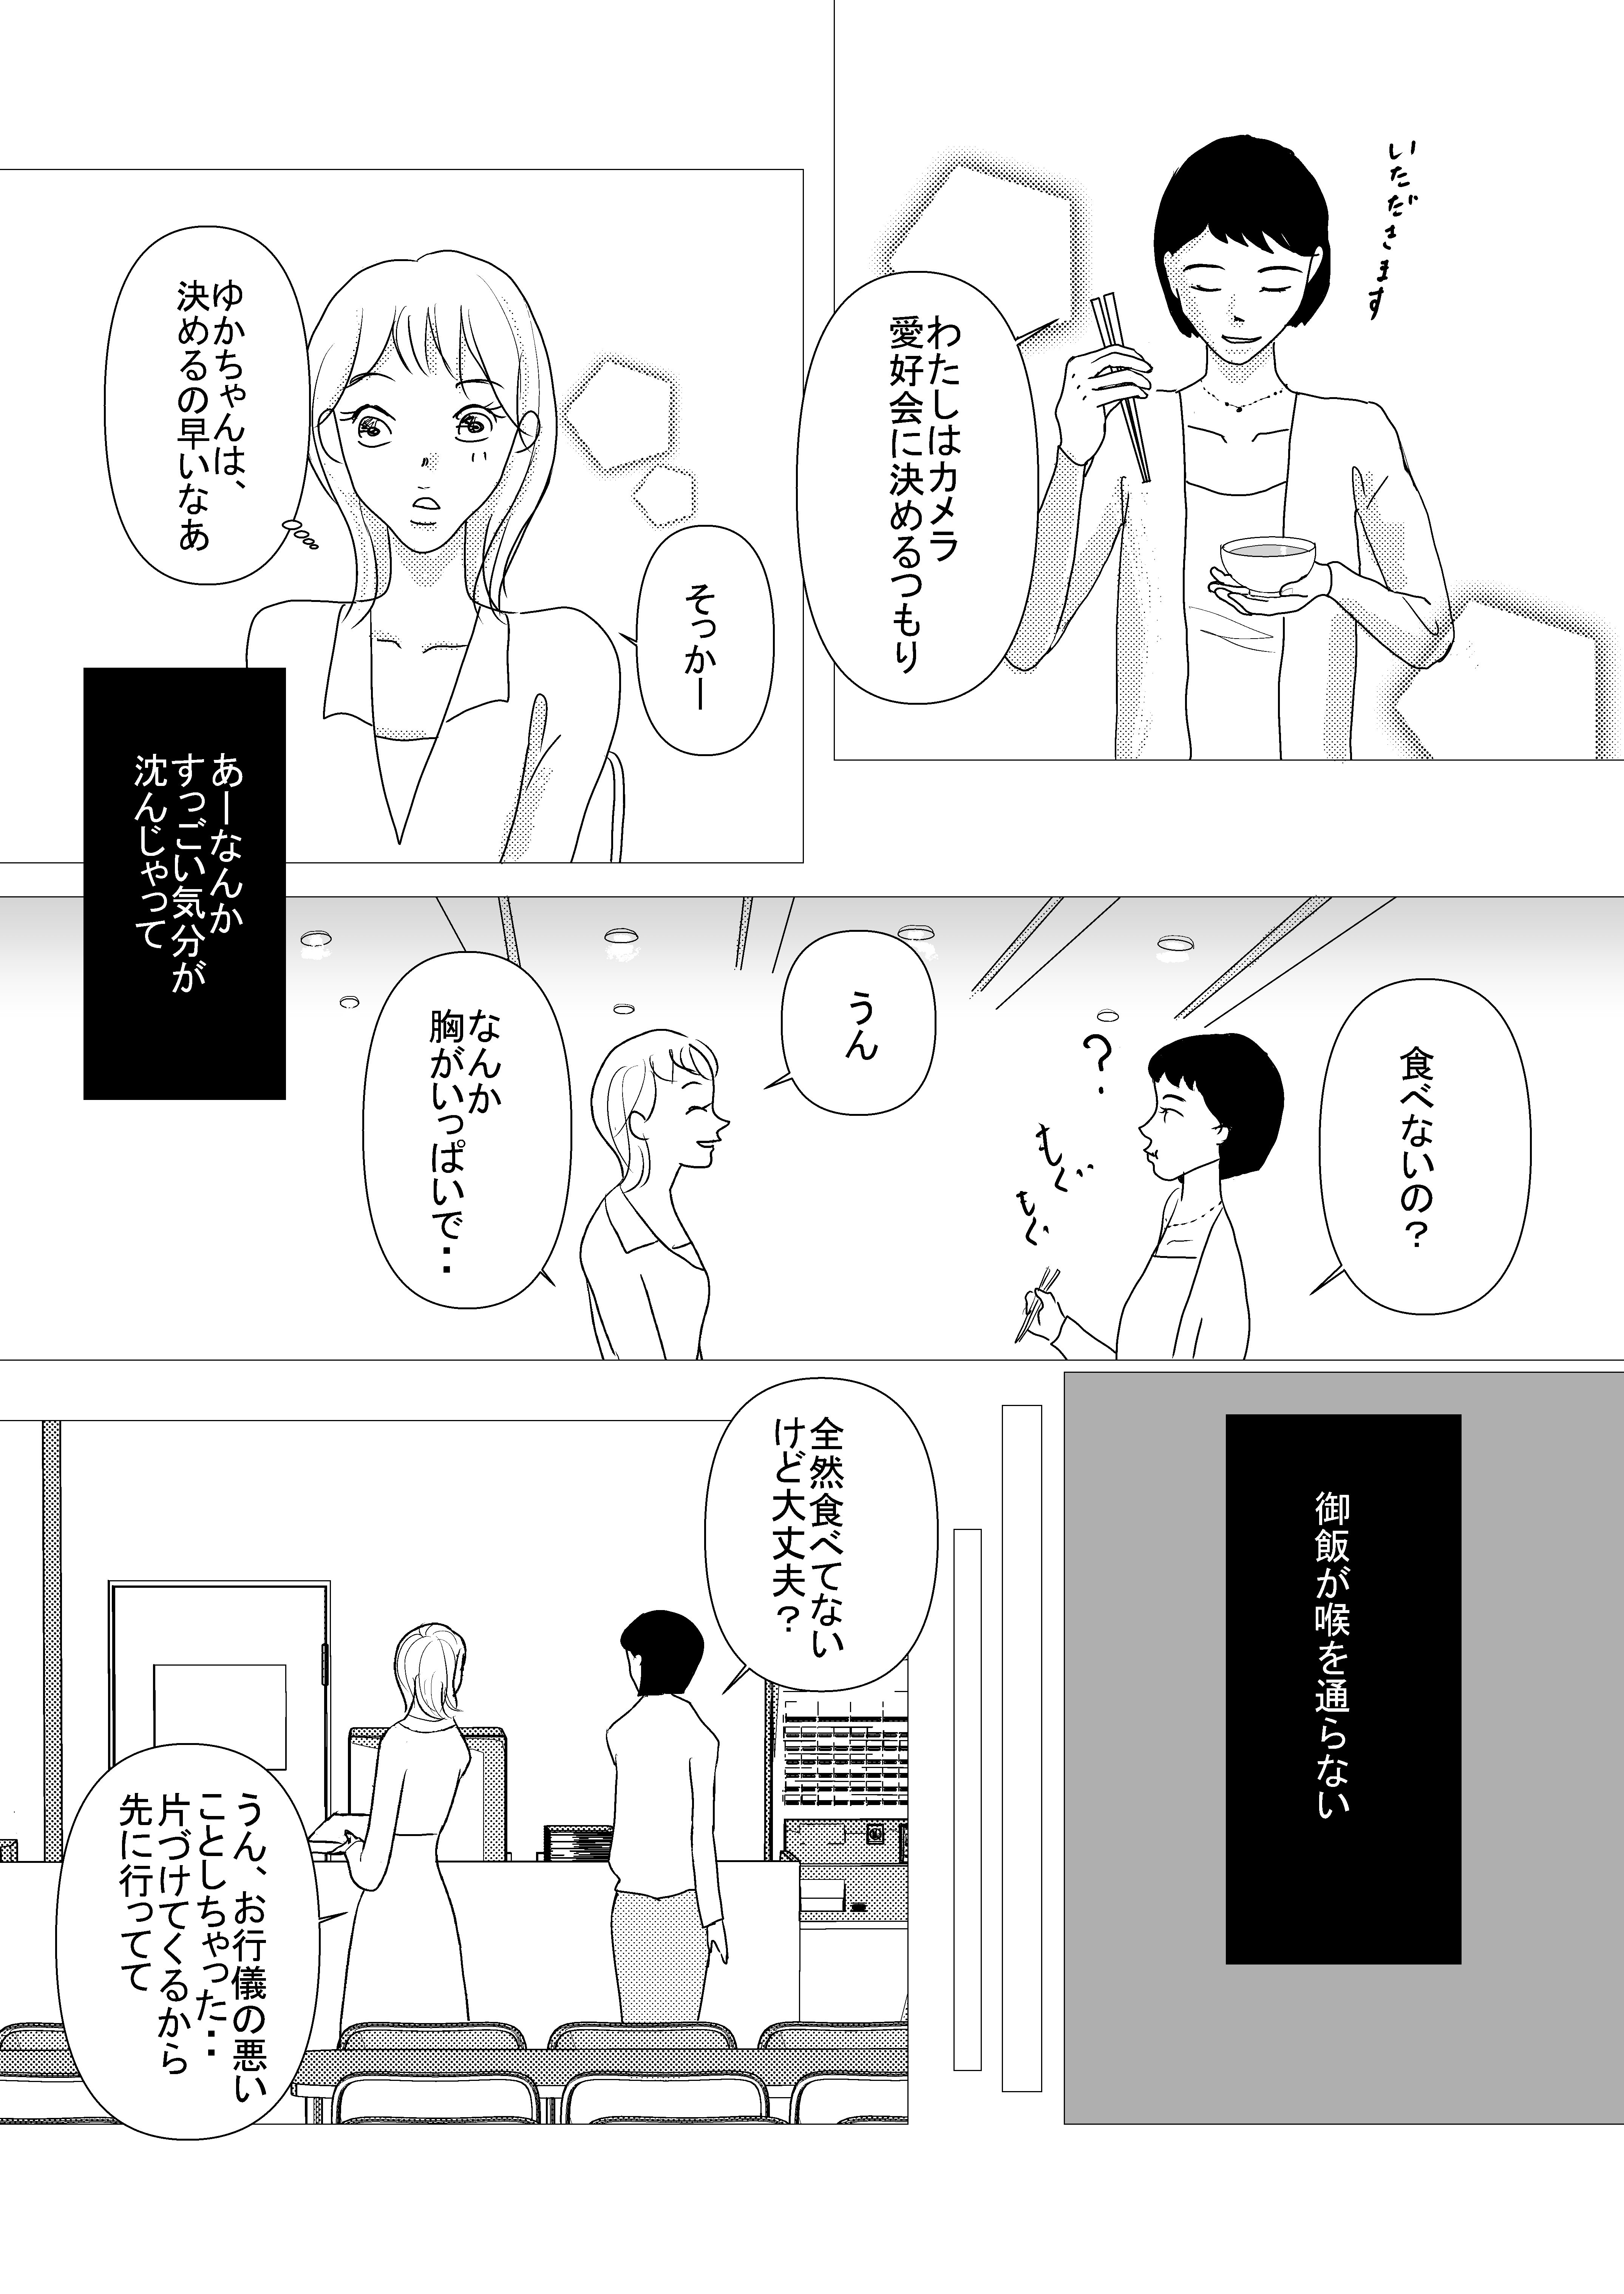 恋愛漫画/大学生/社会人/shoujyo manga/米加夢/11ページ